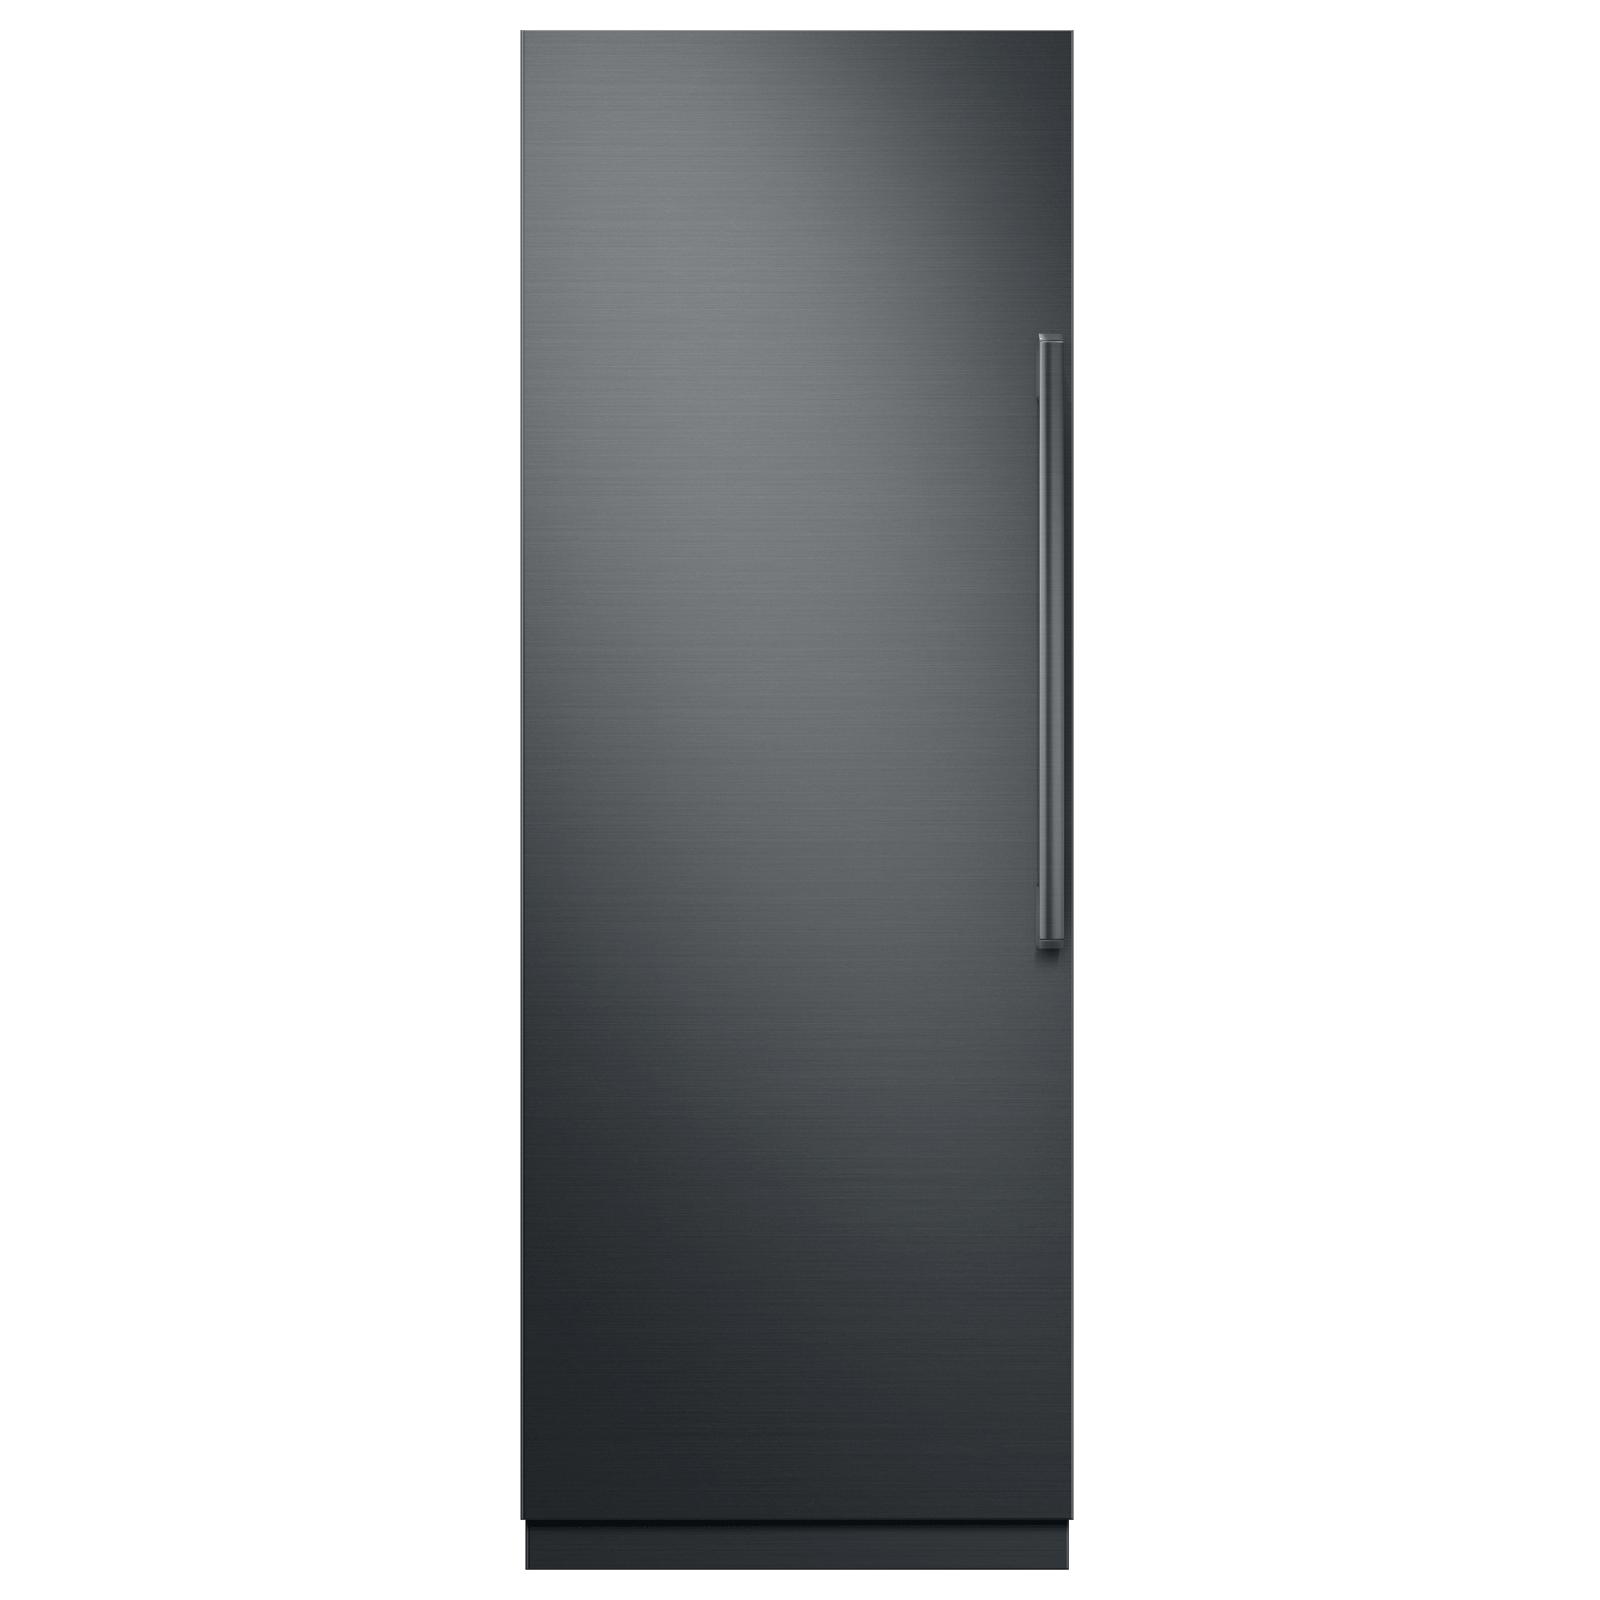 "Dacor Contemporary 30"" Freezer Column -  Right Hinge"